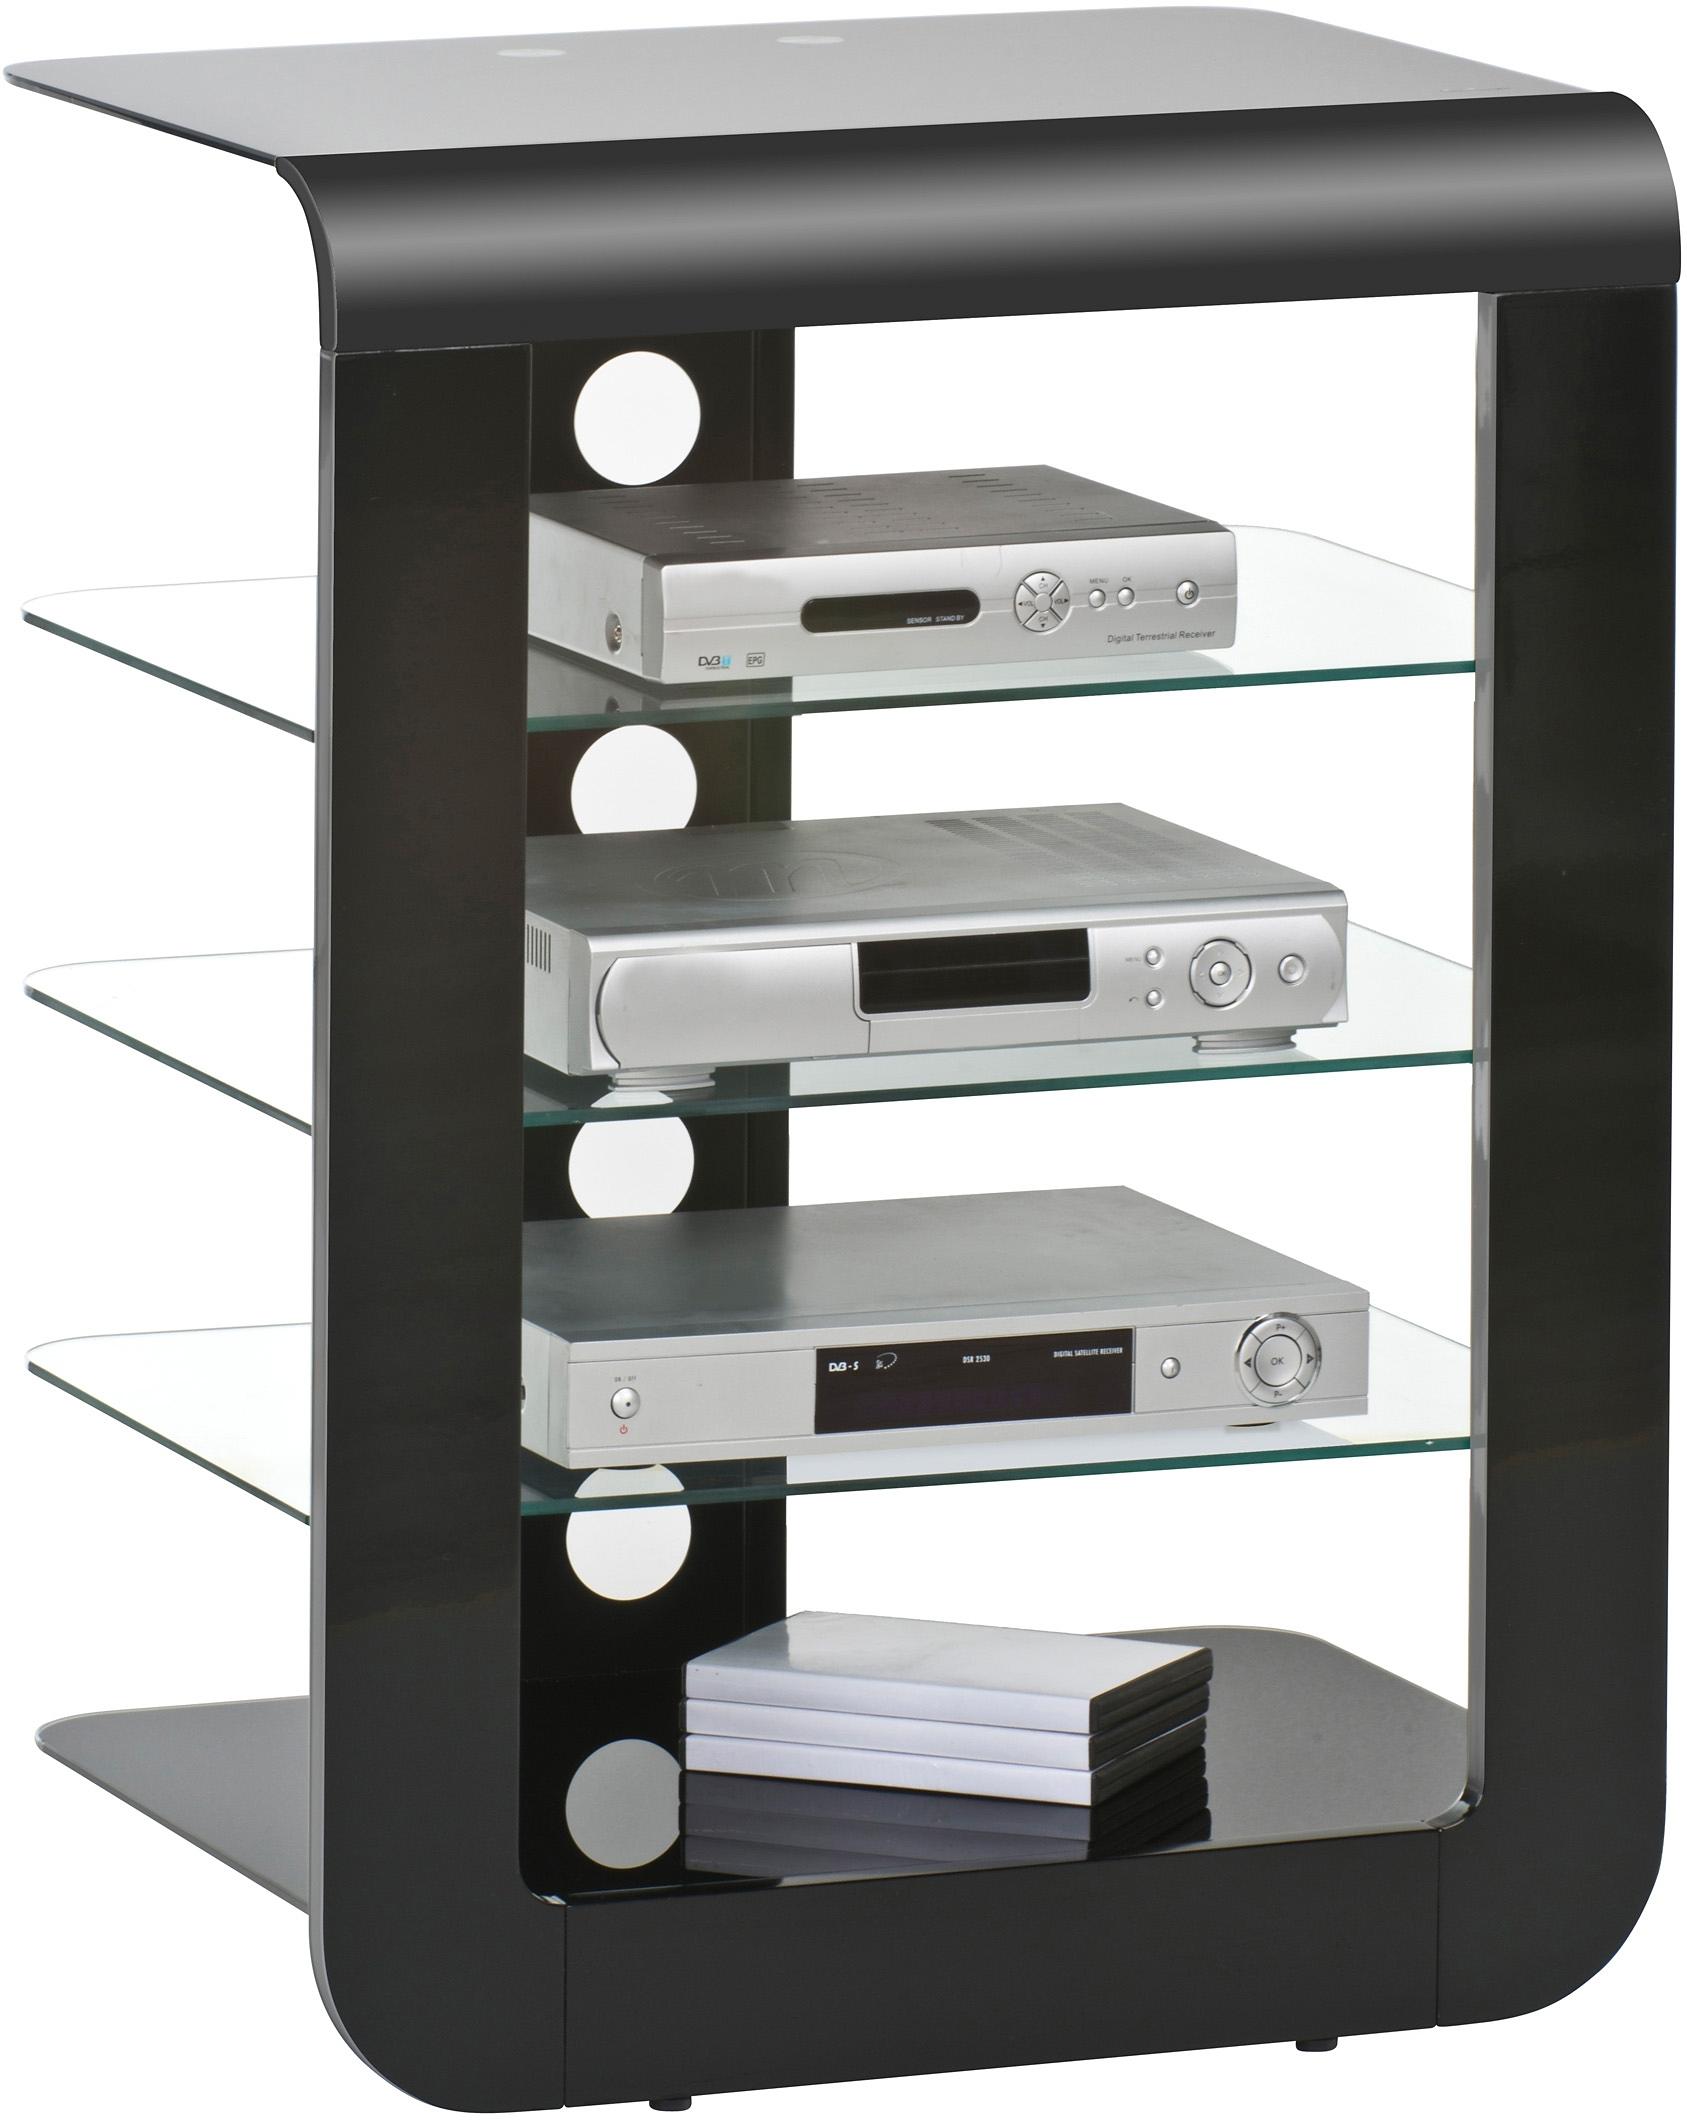 maja m bel tv hifi rek 1646 vind je bij otto. Black Bedroom Furniture Sets. Home Design Ideas